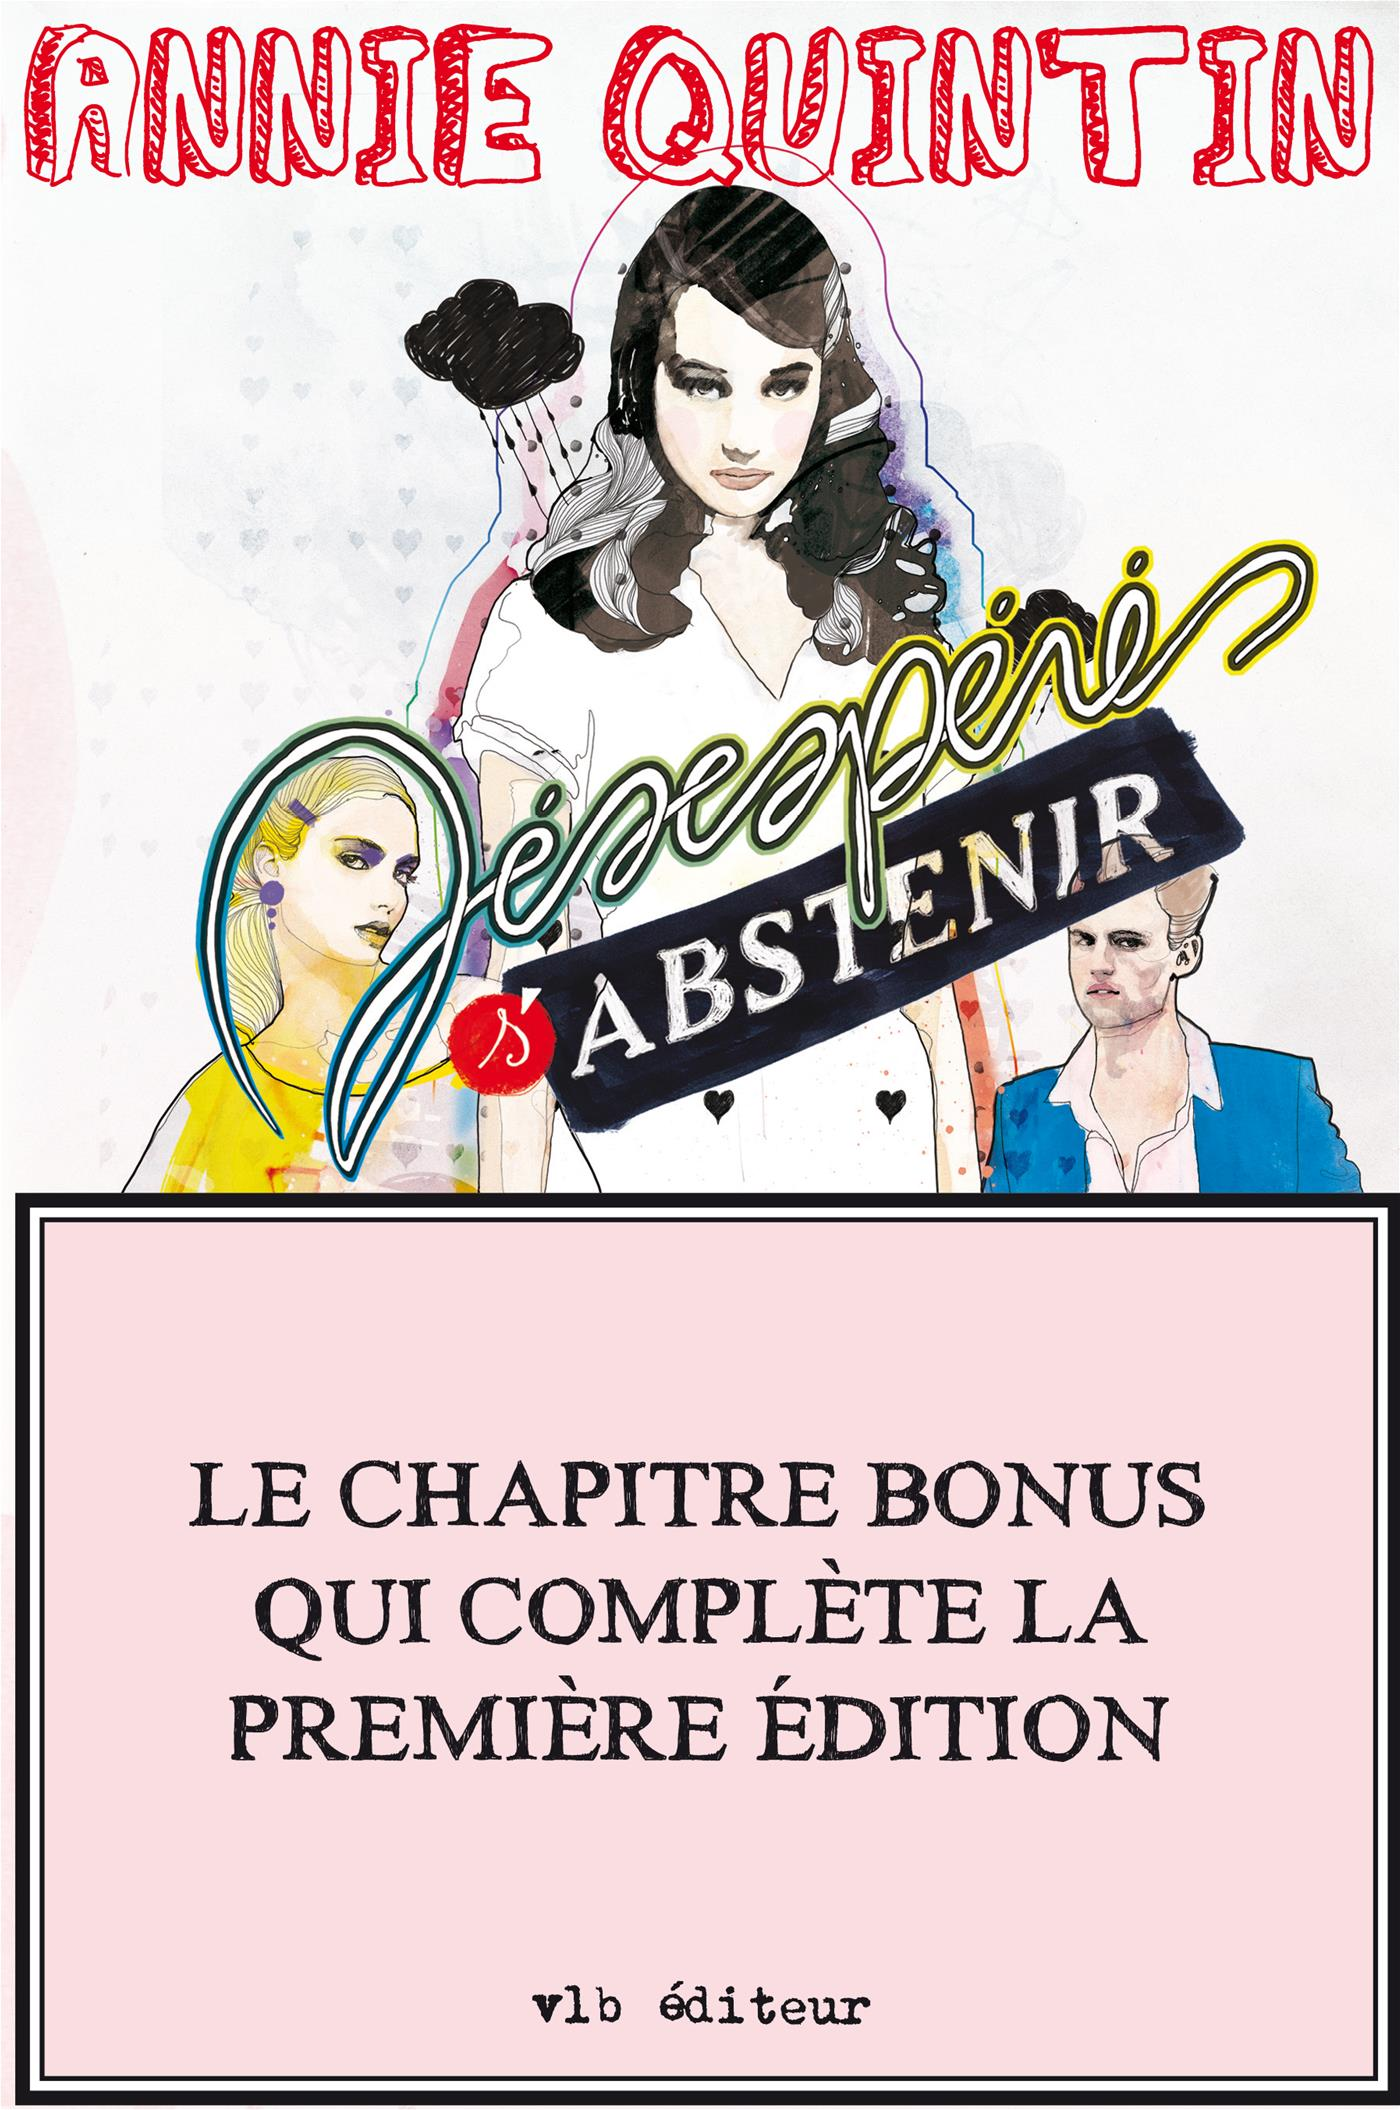 Désespérés s'abstenir - chapitre bonus